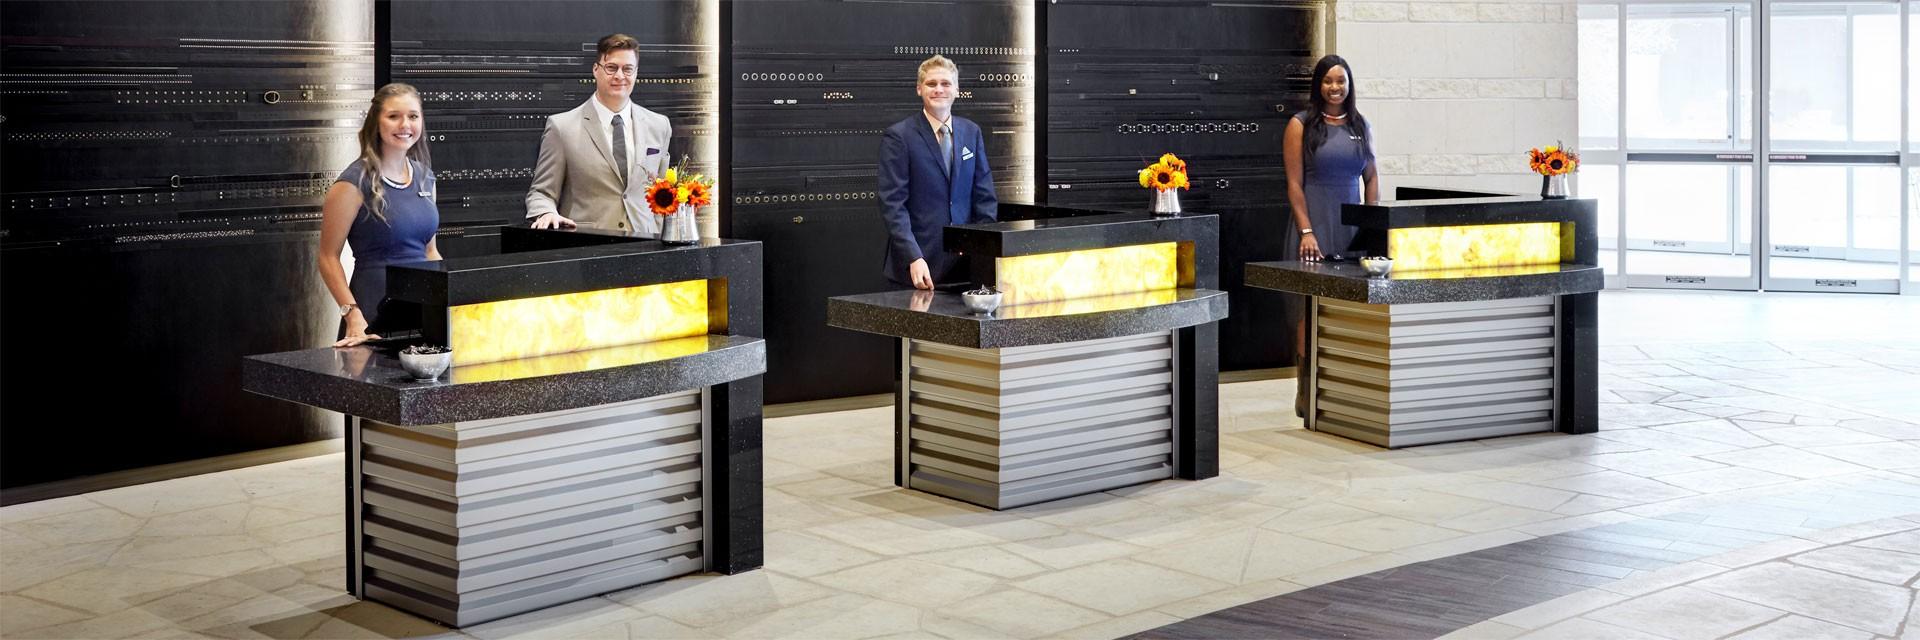 Archer Hotel Austin Front Desk